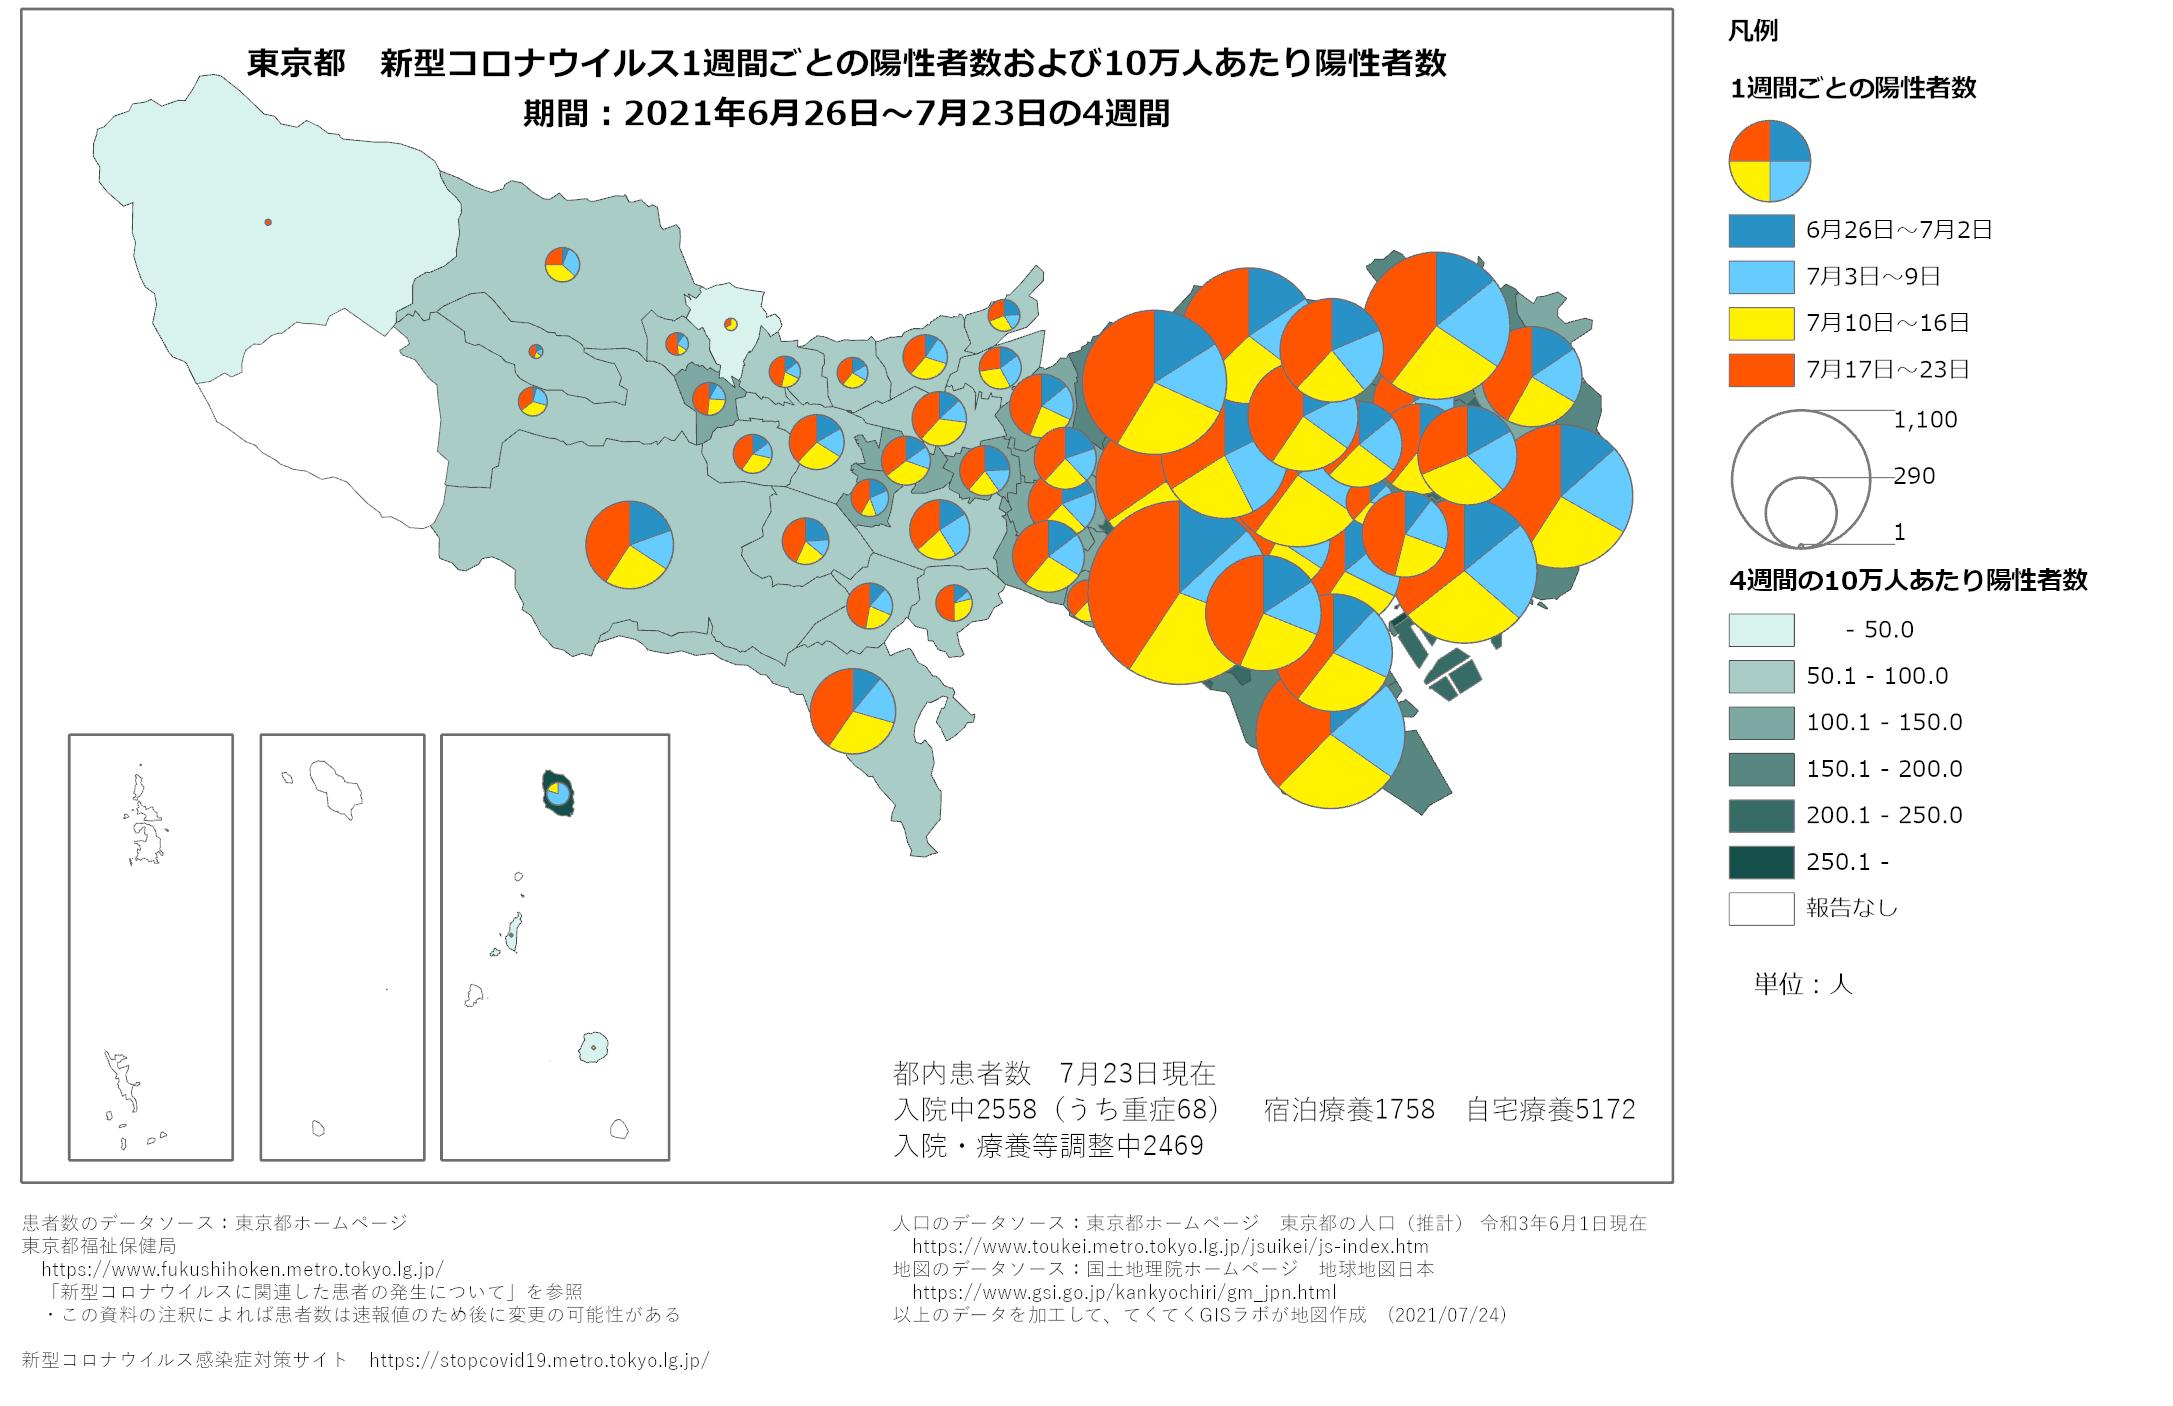 1週間ごと感染者数、東京都、6月26日〜7月23日